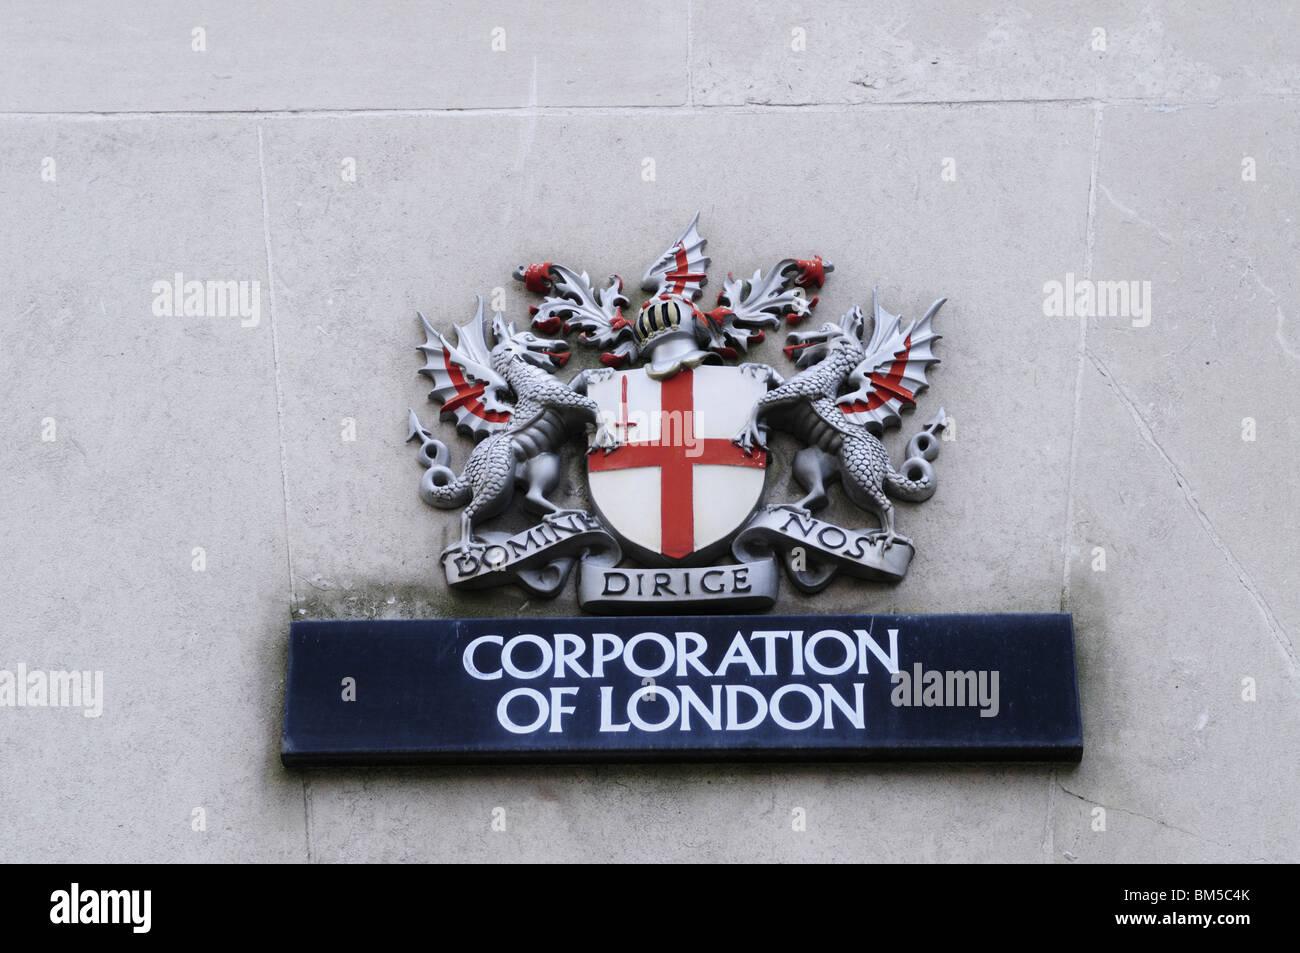 Corporation of London Coat of Arms Insignia, London, England, UK - Stock Image